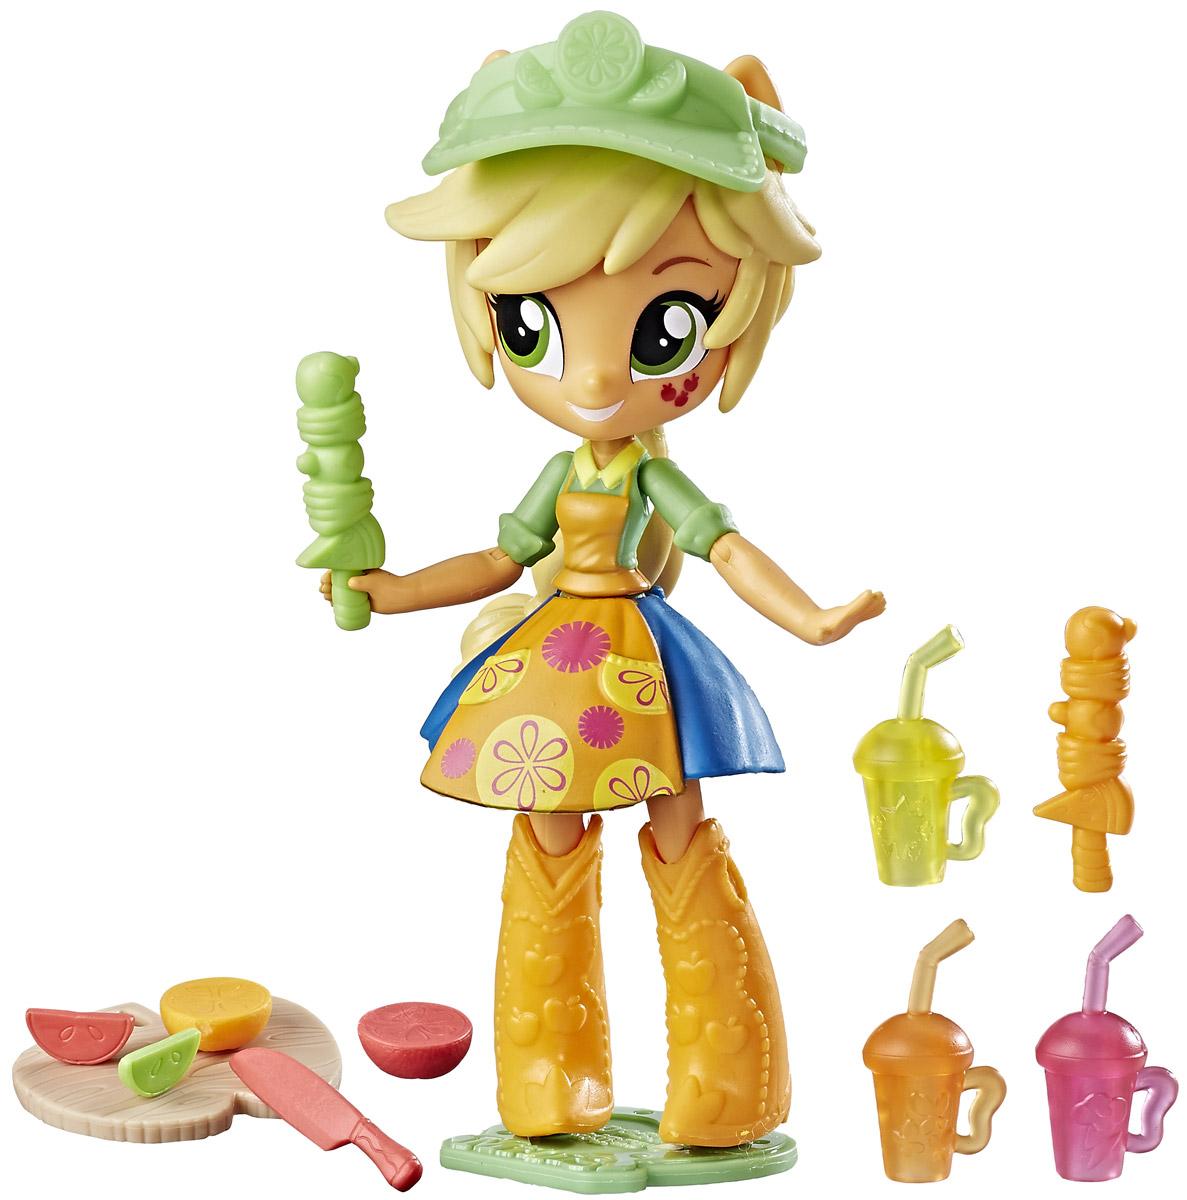 My Little Pony Equestria Girls Мини-кукла Applejack Fruit Smoothies Shop my little pony equestria girls мини кукла applejack fruit smoothies shop